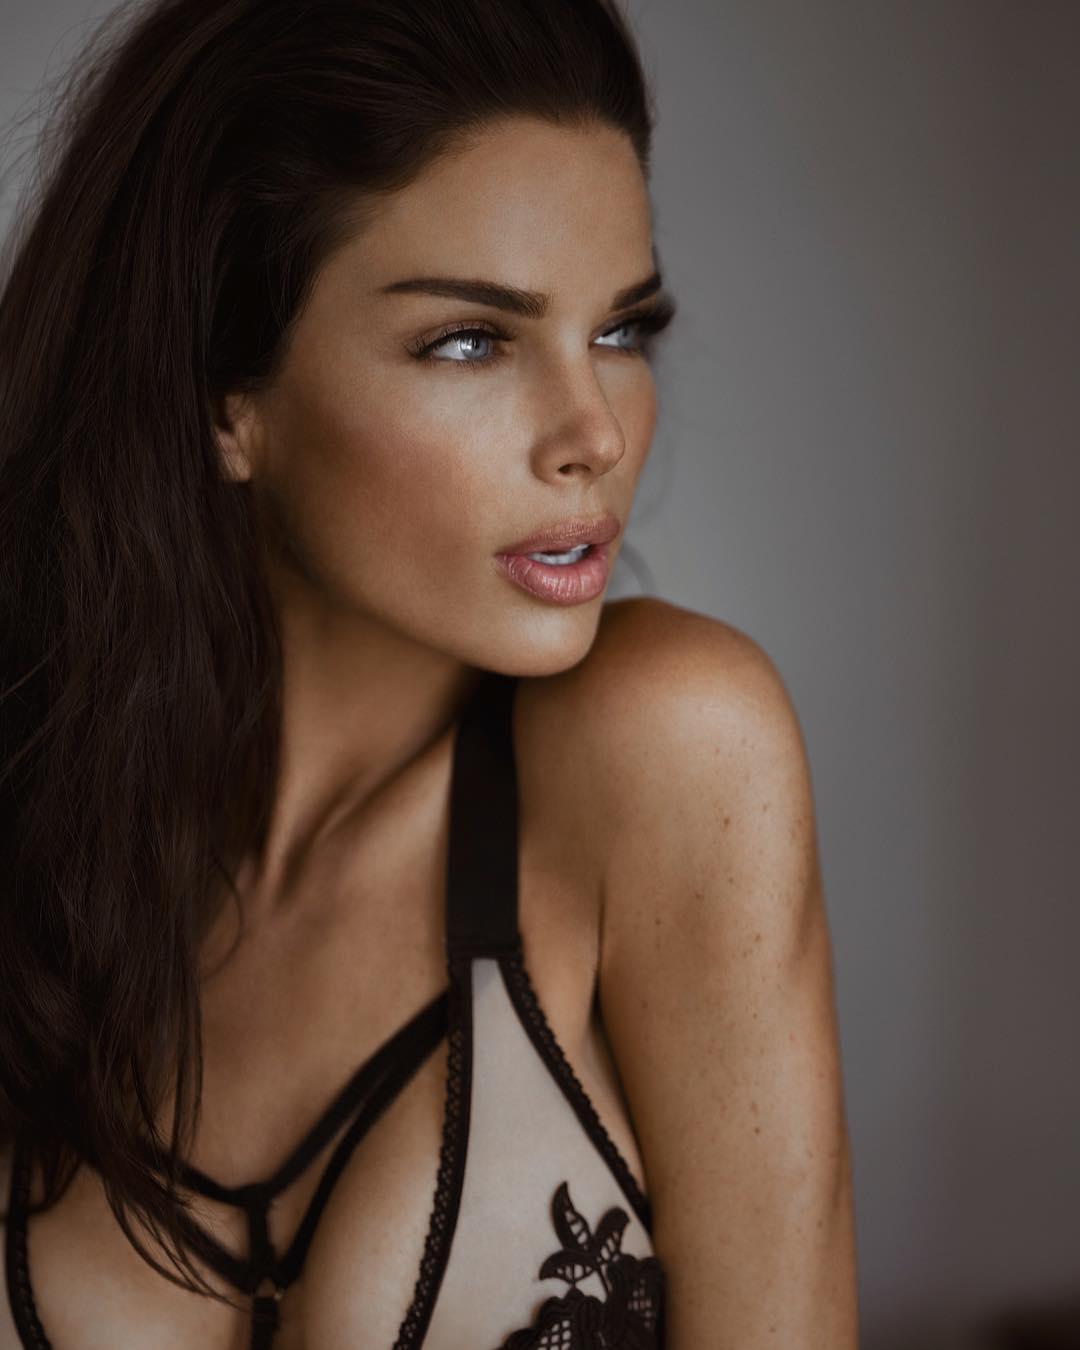 underwear Photos Mariacarla Boscono naked photo 2017